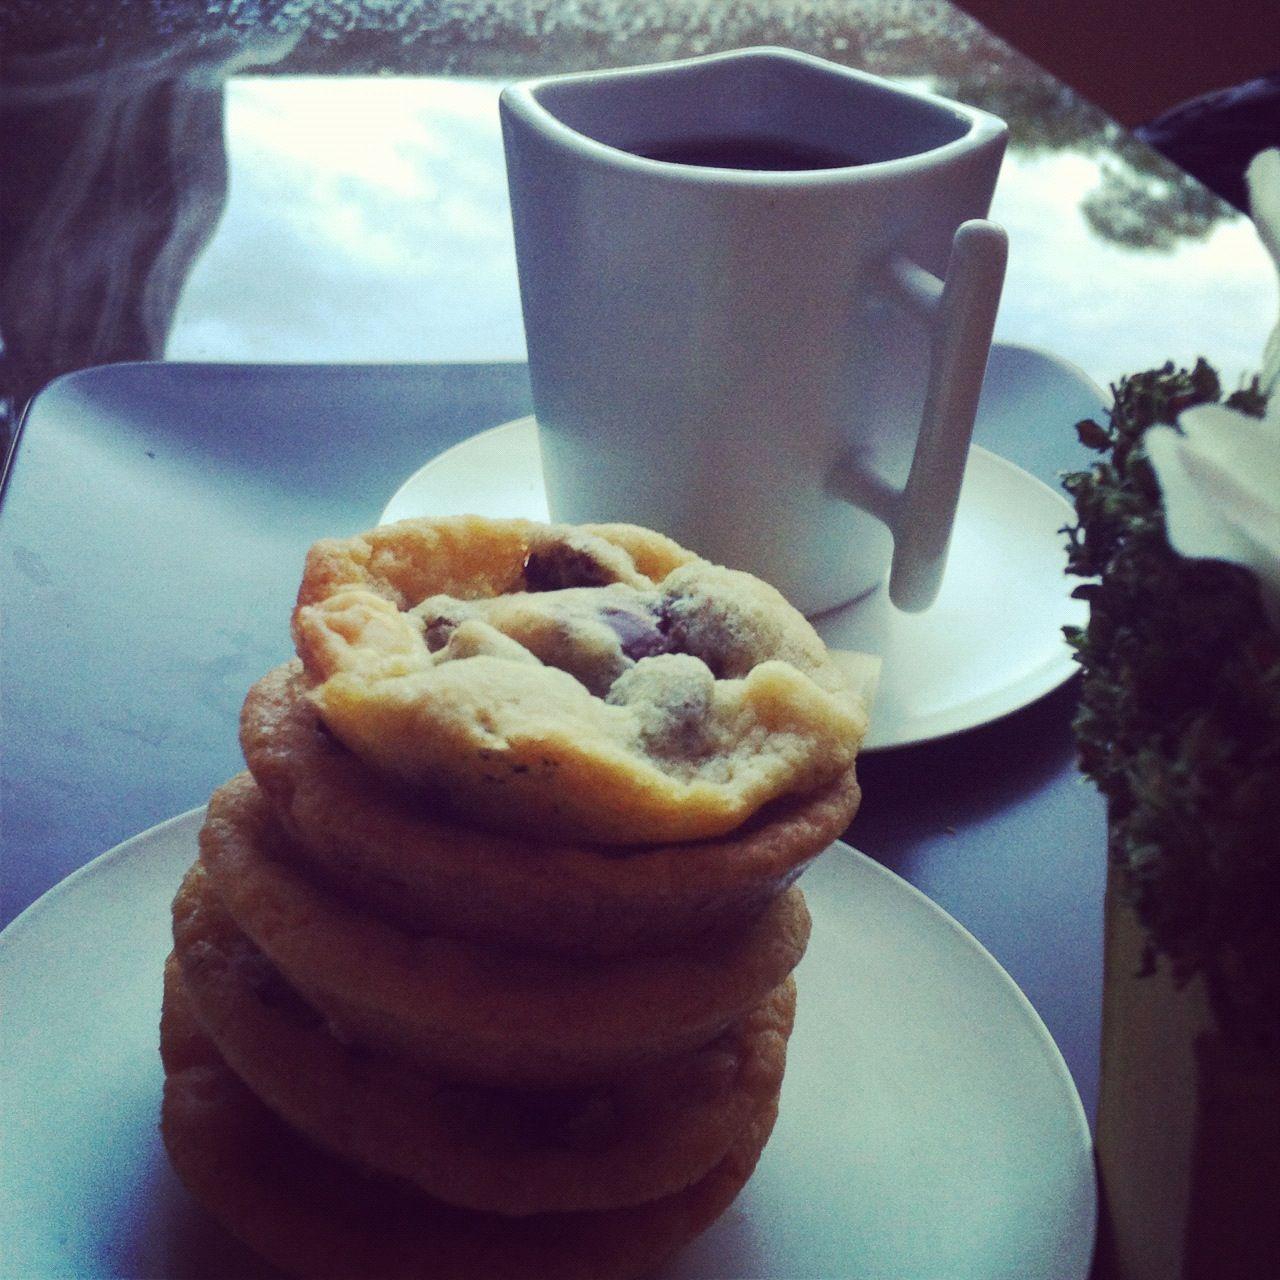 Irresistible Chocolate Chip Cookies, White Chocolate & Milk Chocolate Chips!